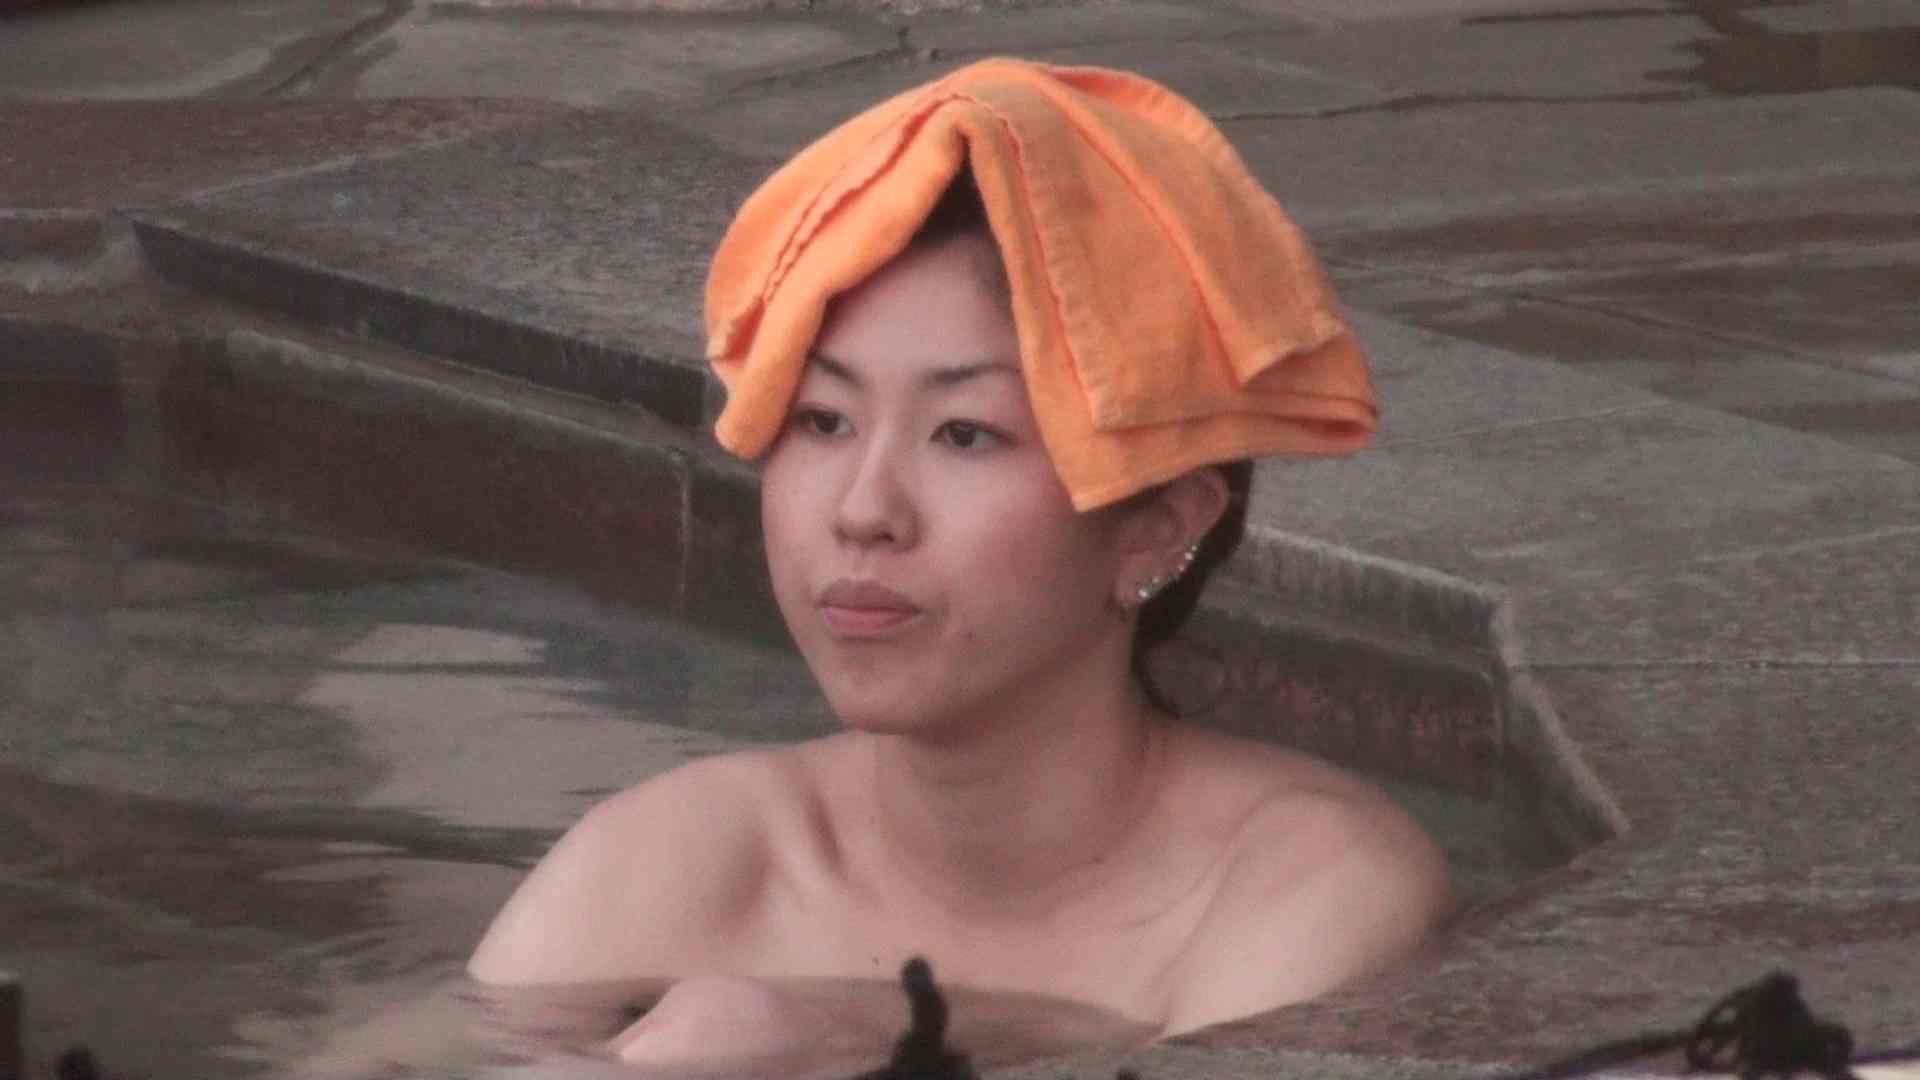 Aquaな露天風呂Vol.135 盗撮師作品 | 露天風呂突入  105pic 85